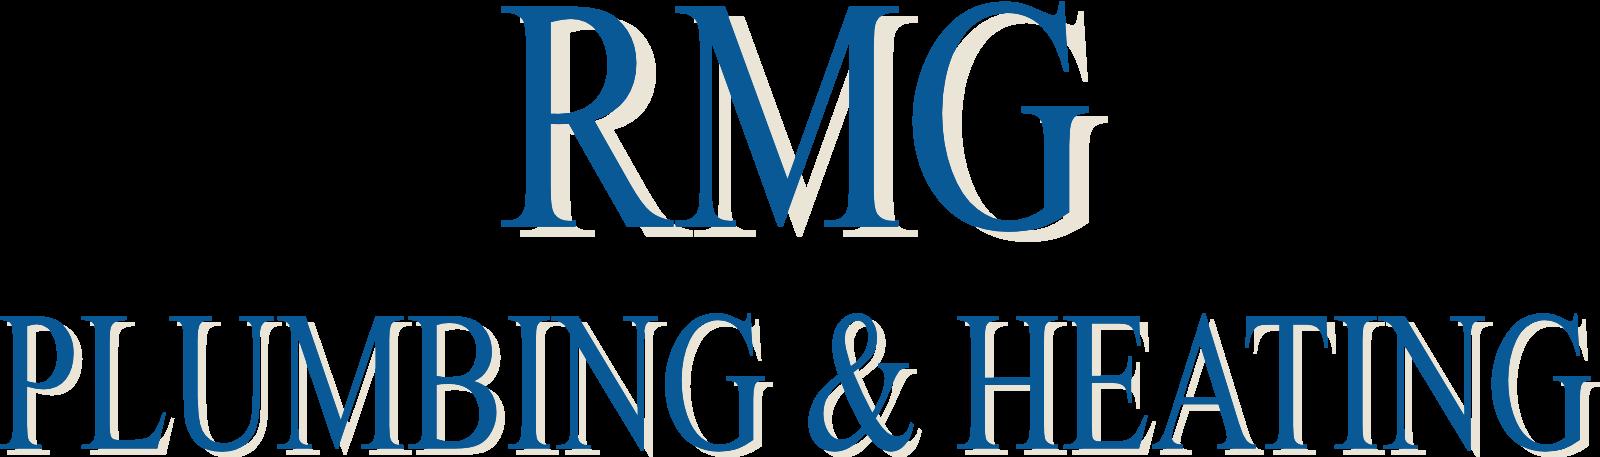 RMG Plumbing & Heating